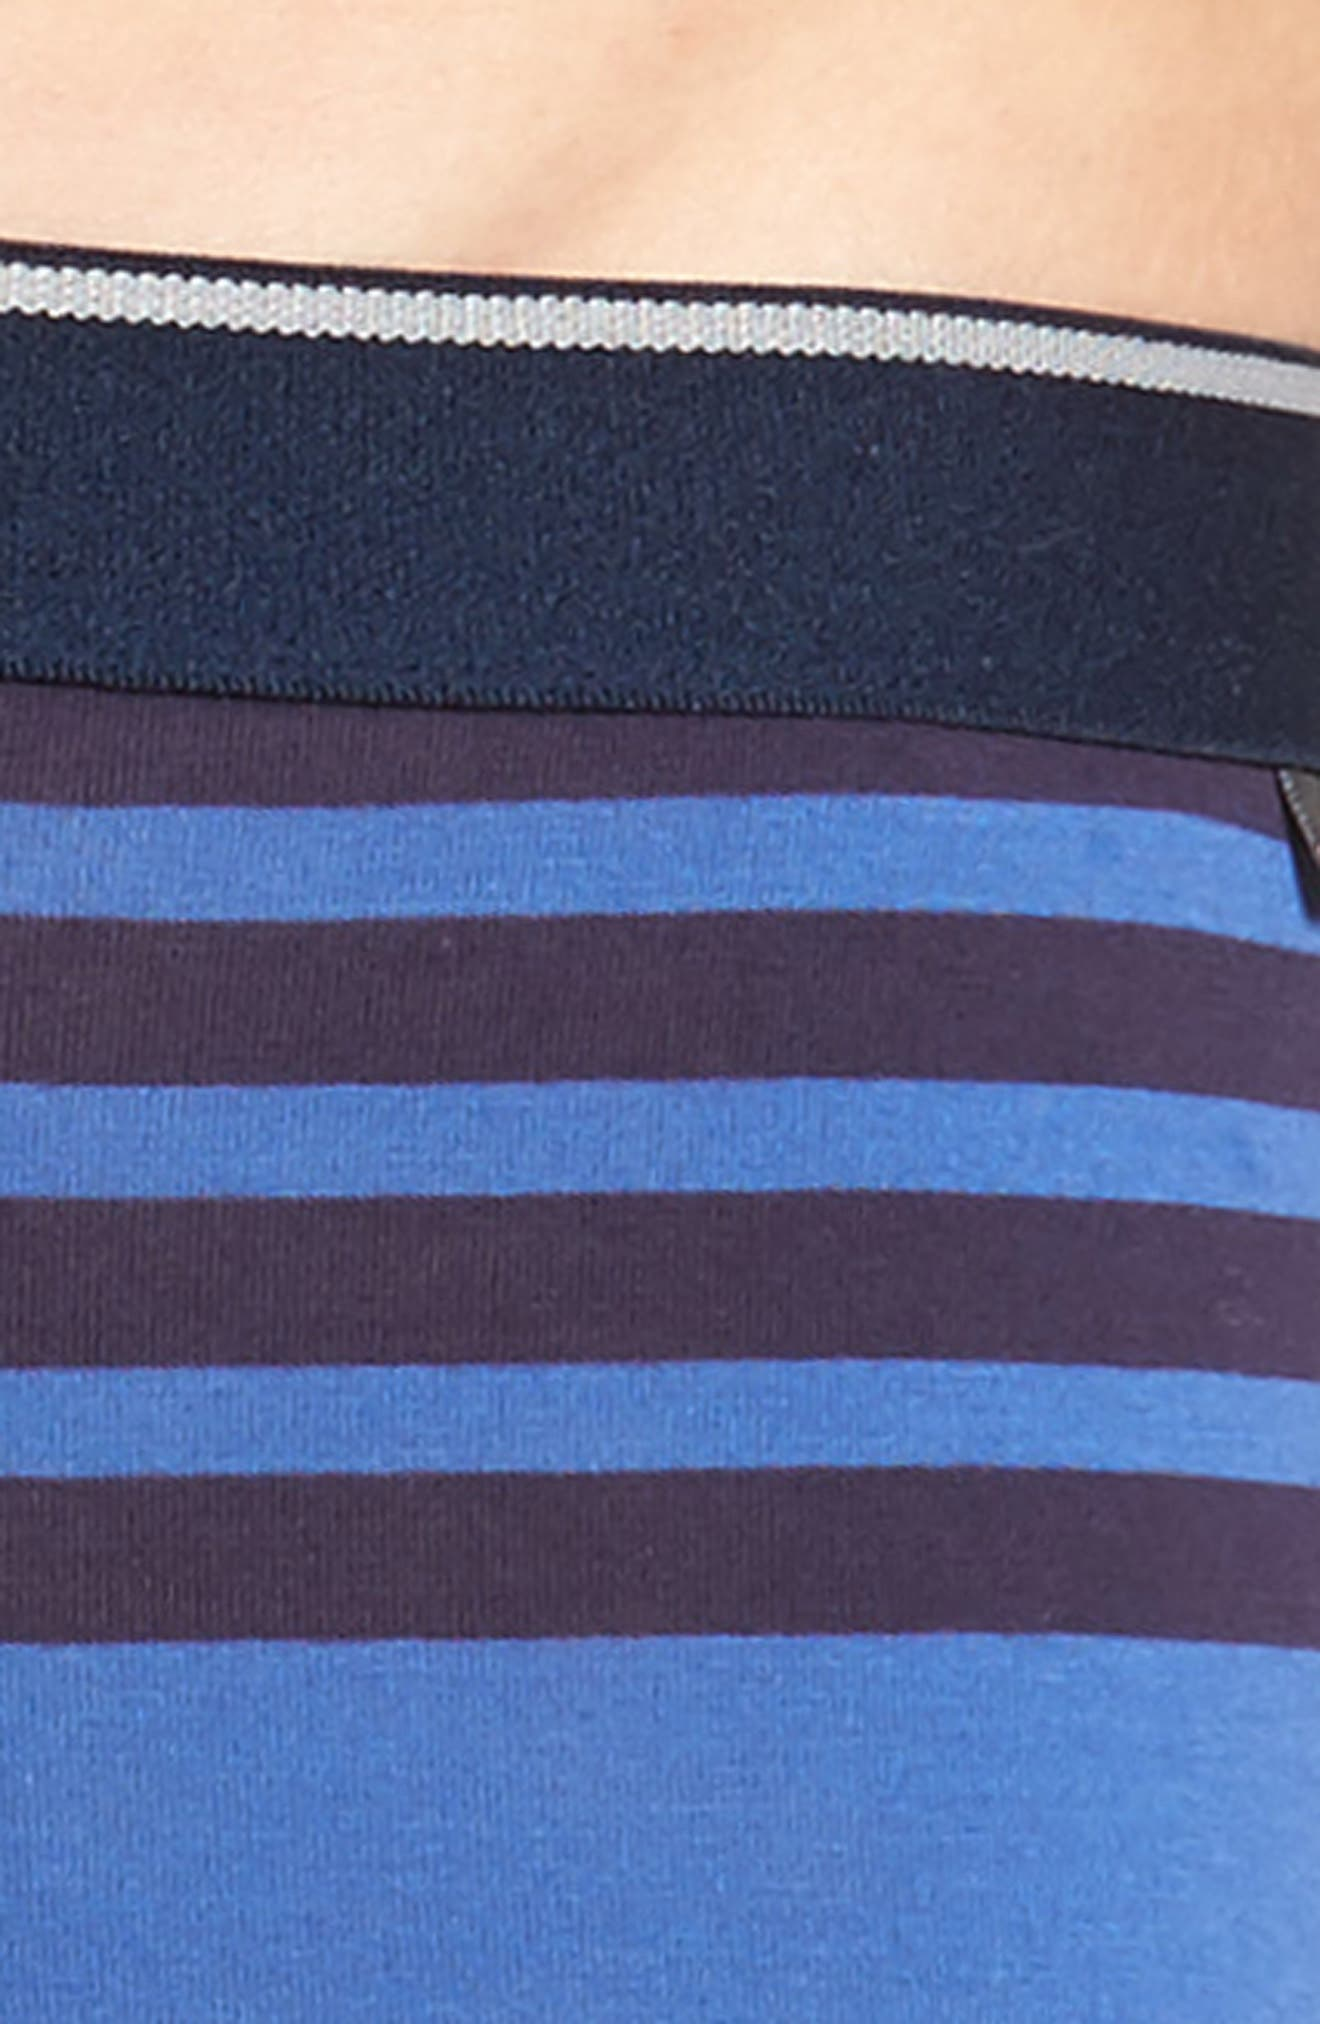 3-Pack Boxer Briefs,                             Alternate thumbnail 5, color,                             Navy/ Navy-Blue Stripe